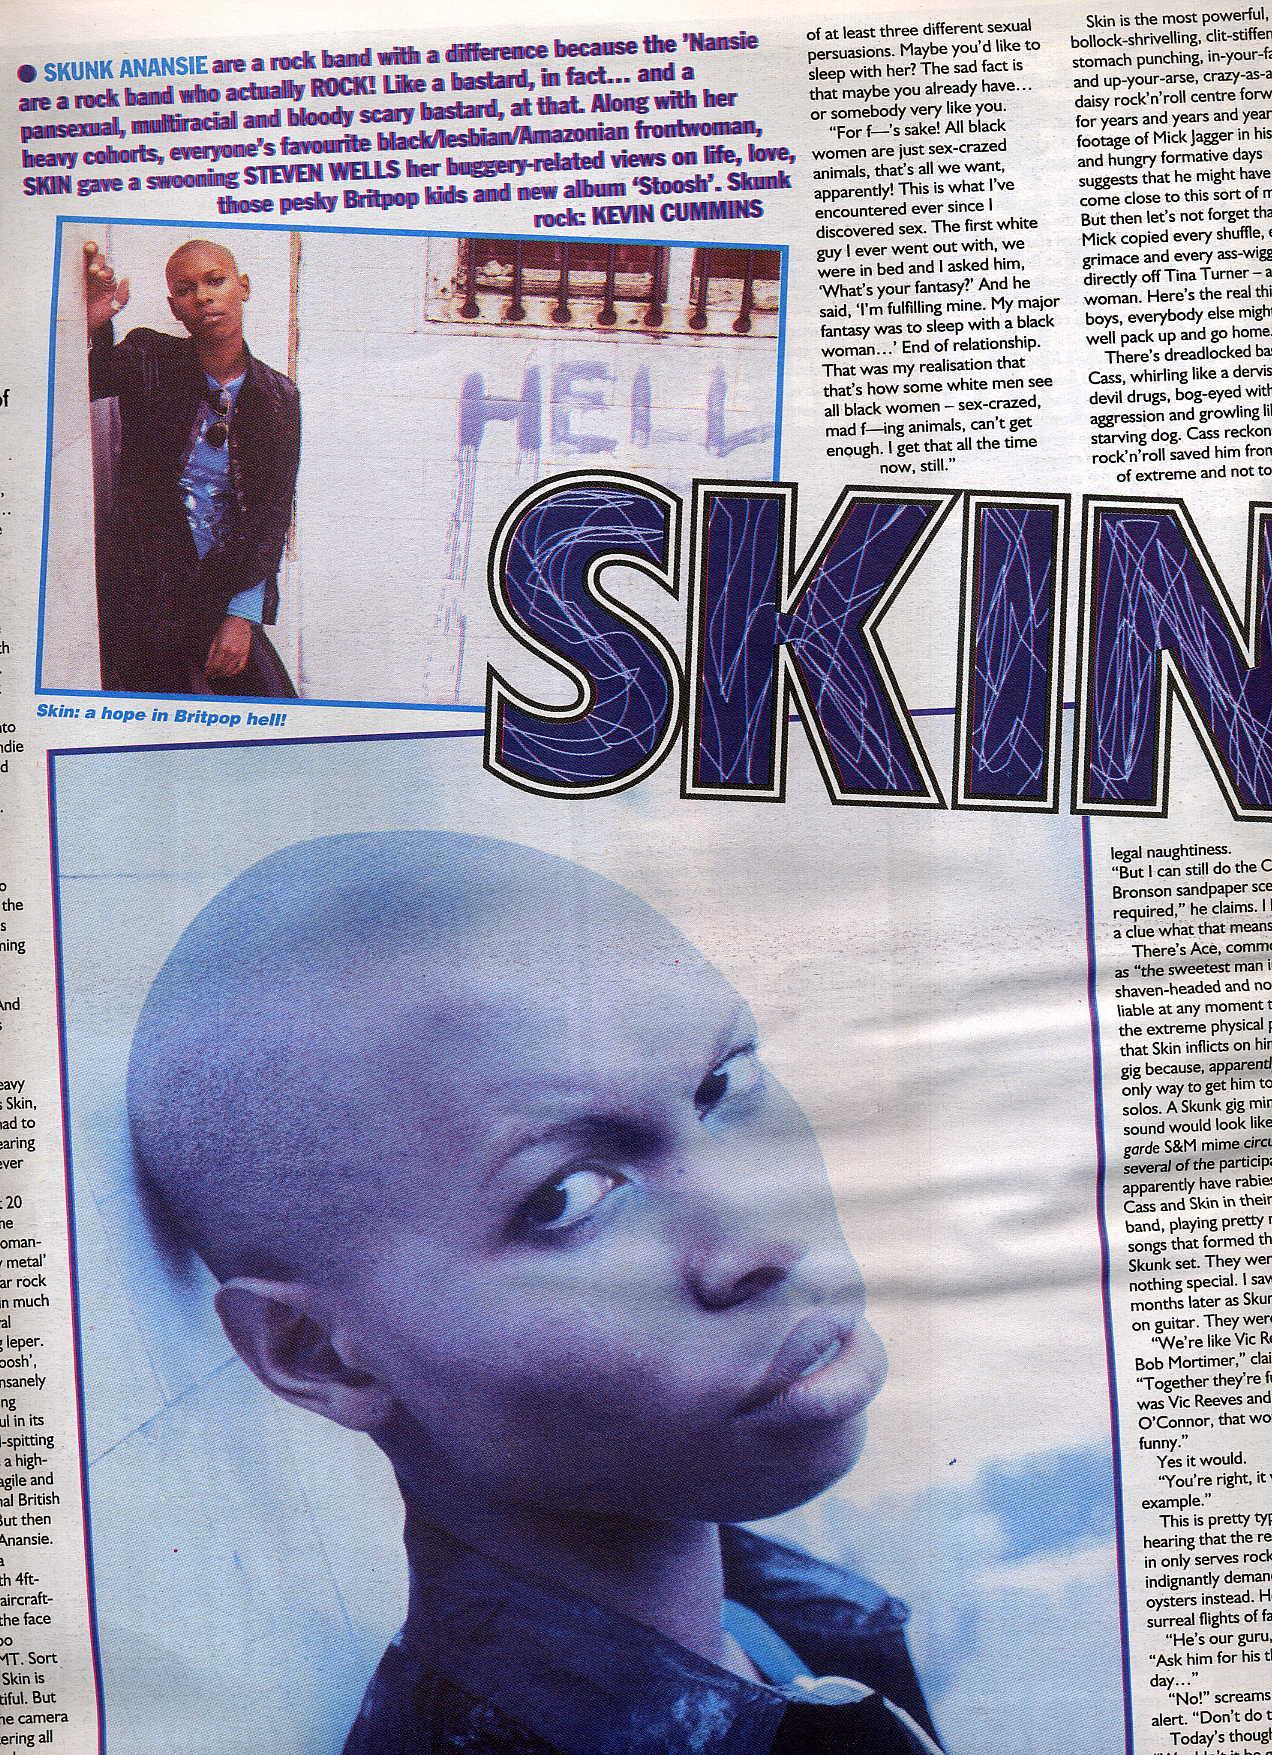 NME-comp1